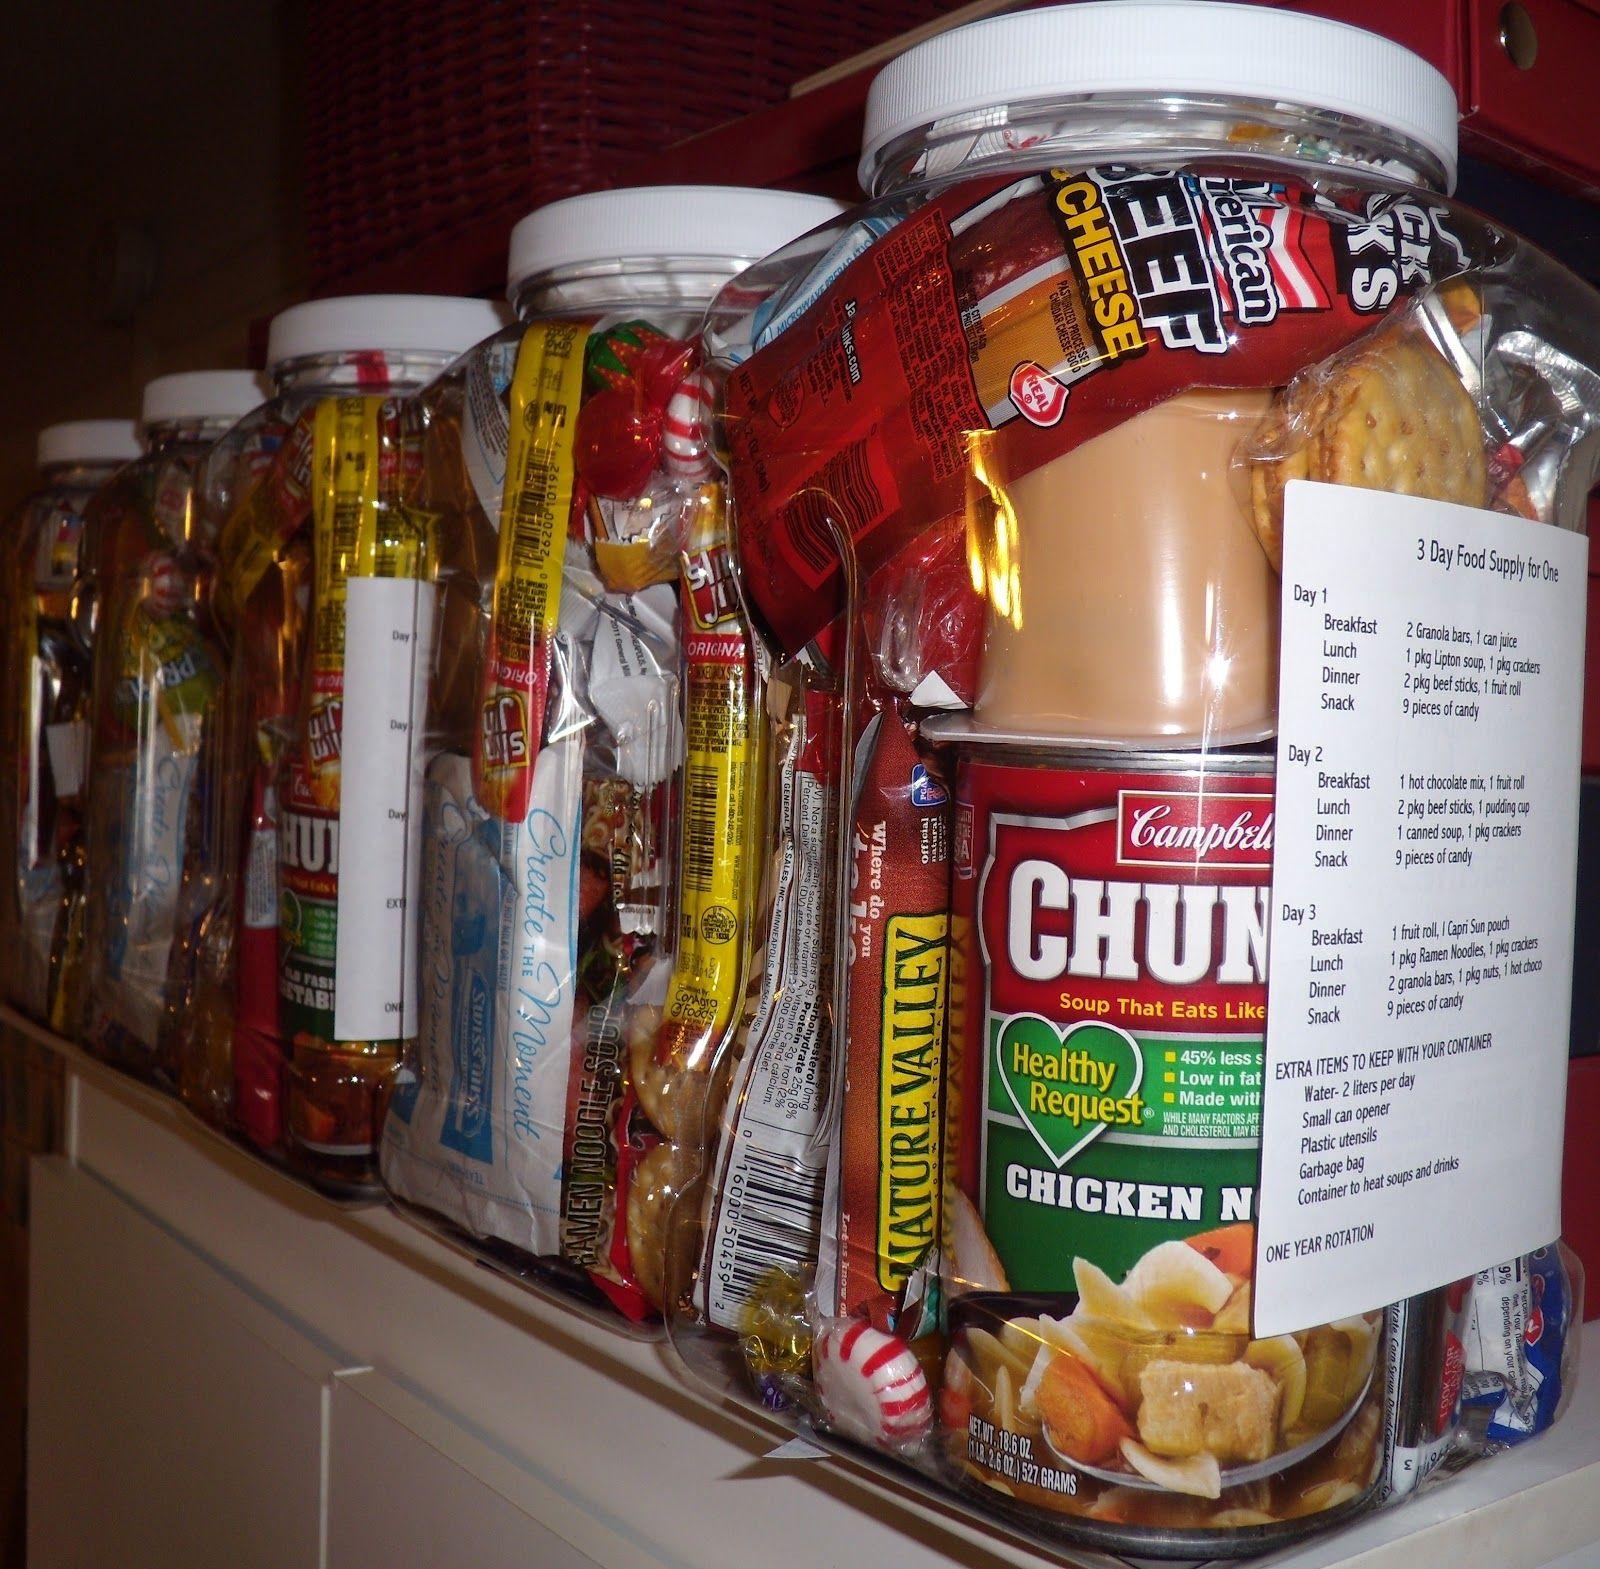 Homemade 72 Hour Emergency Food Supply Kits | Year Zero Survival ...